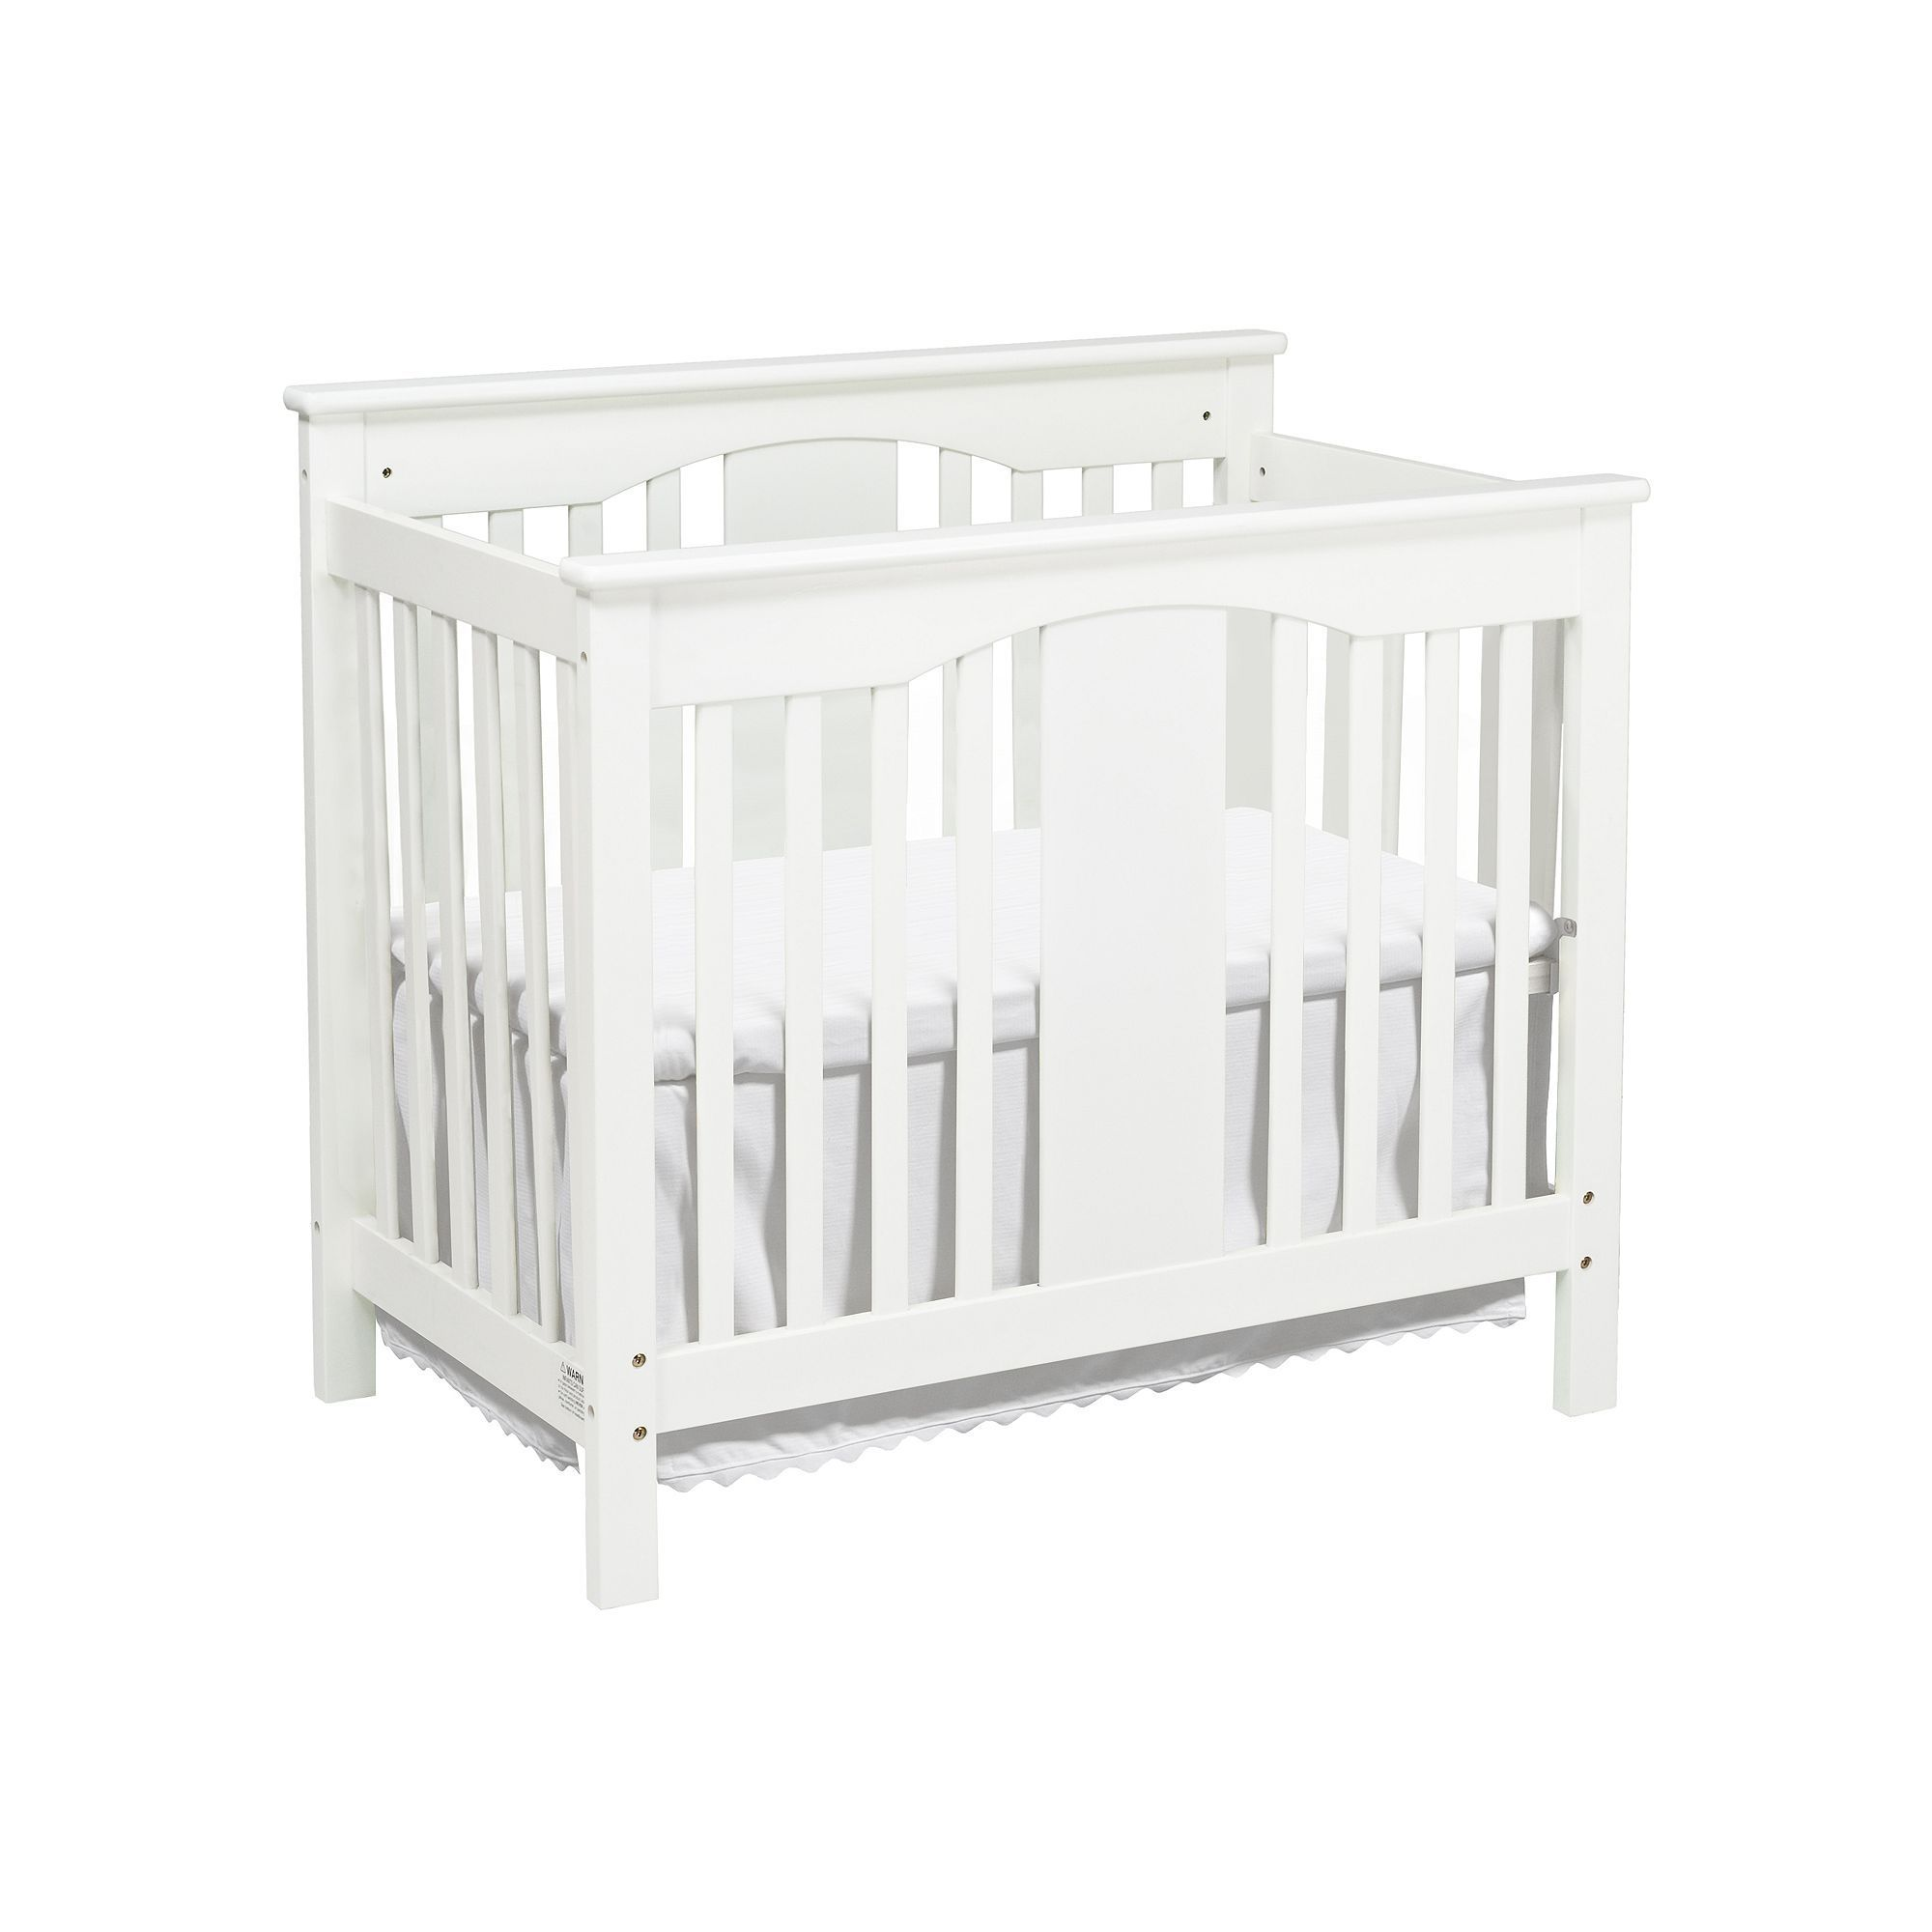 Davinci Annabelle 2 In 1 Convertible Mini Crib Mini Crib Bedding Mini Crib Cribs